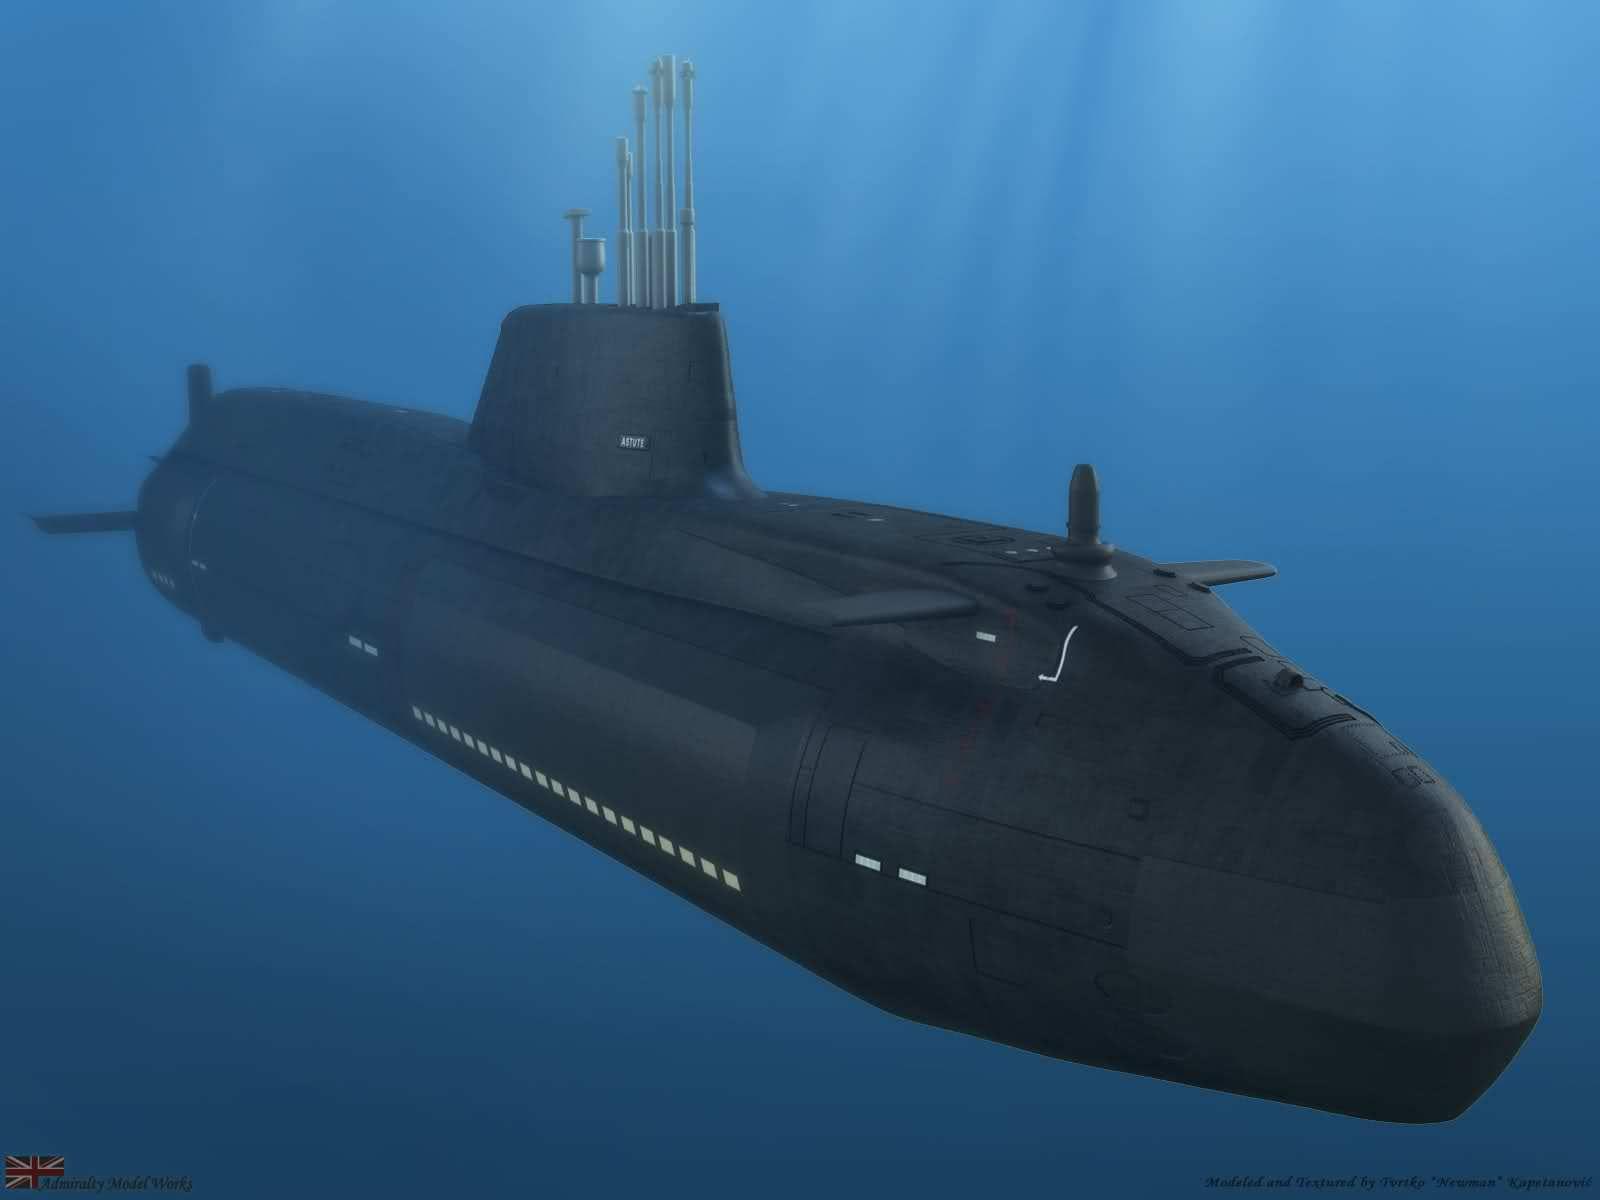 Astute Class SSN Submarine – Royal Navy